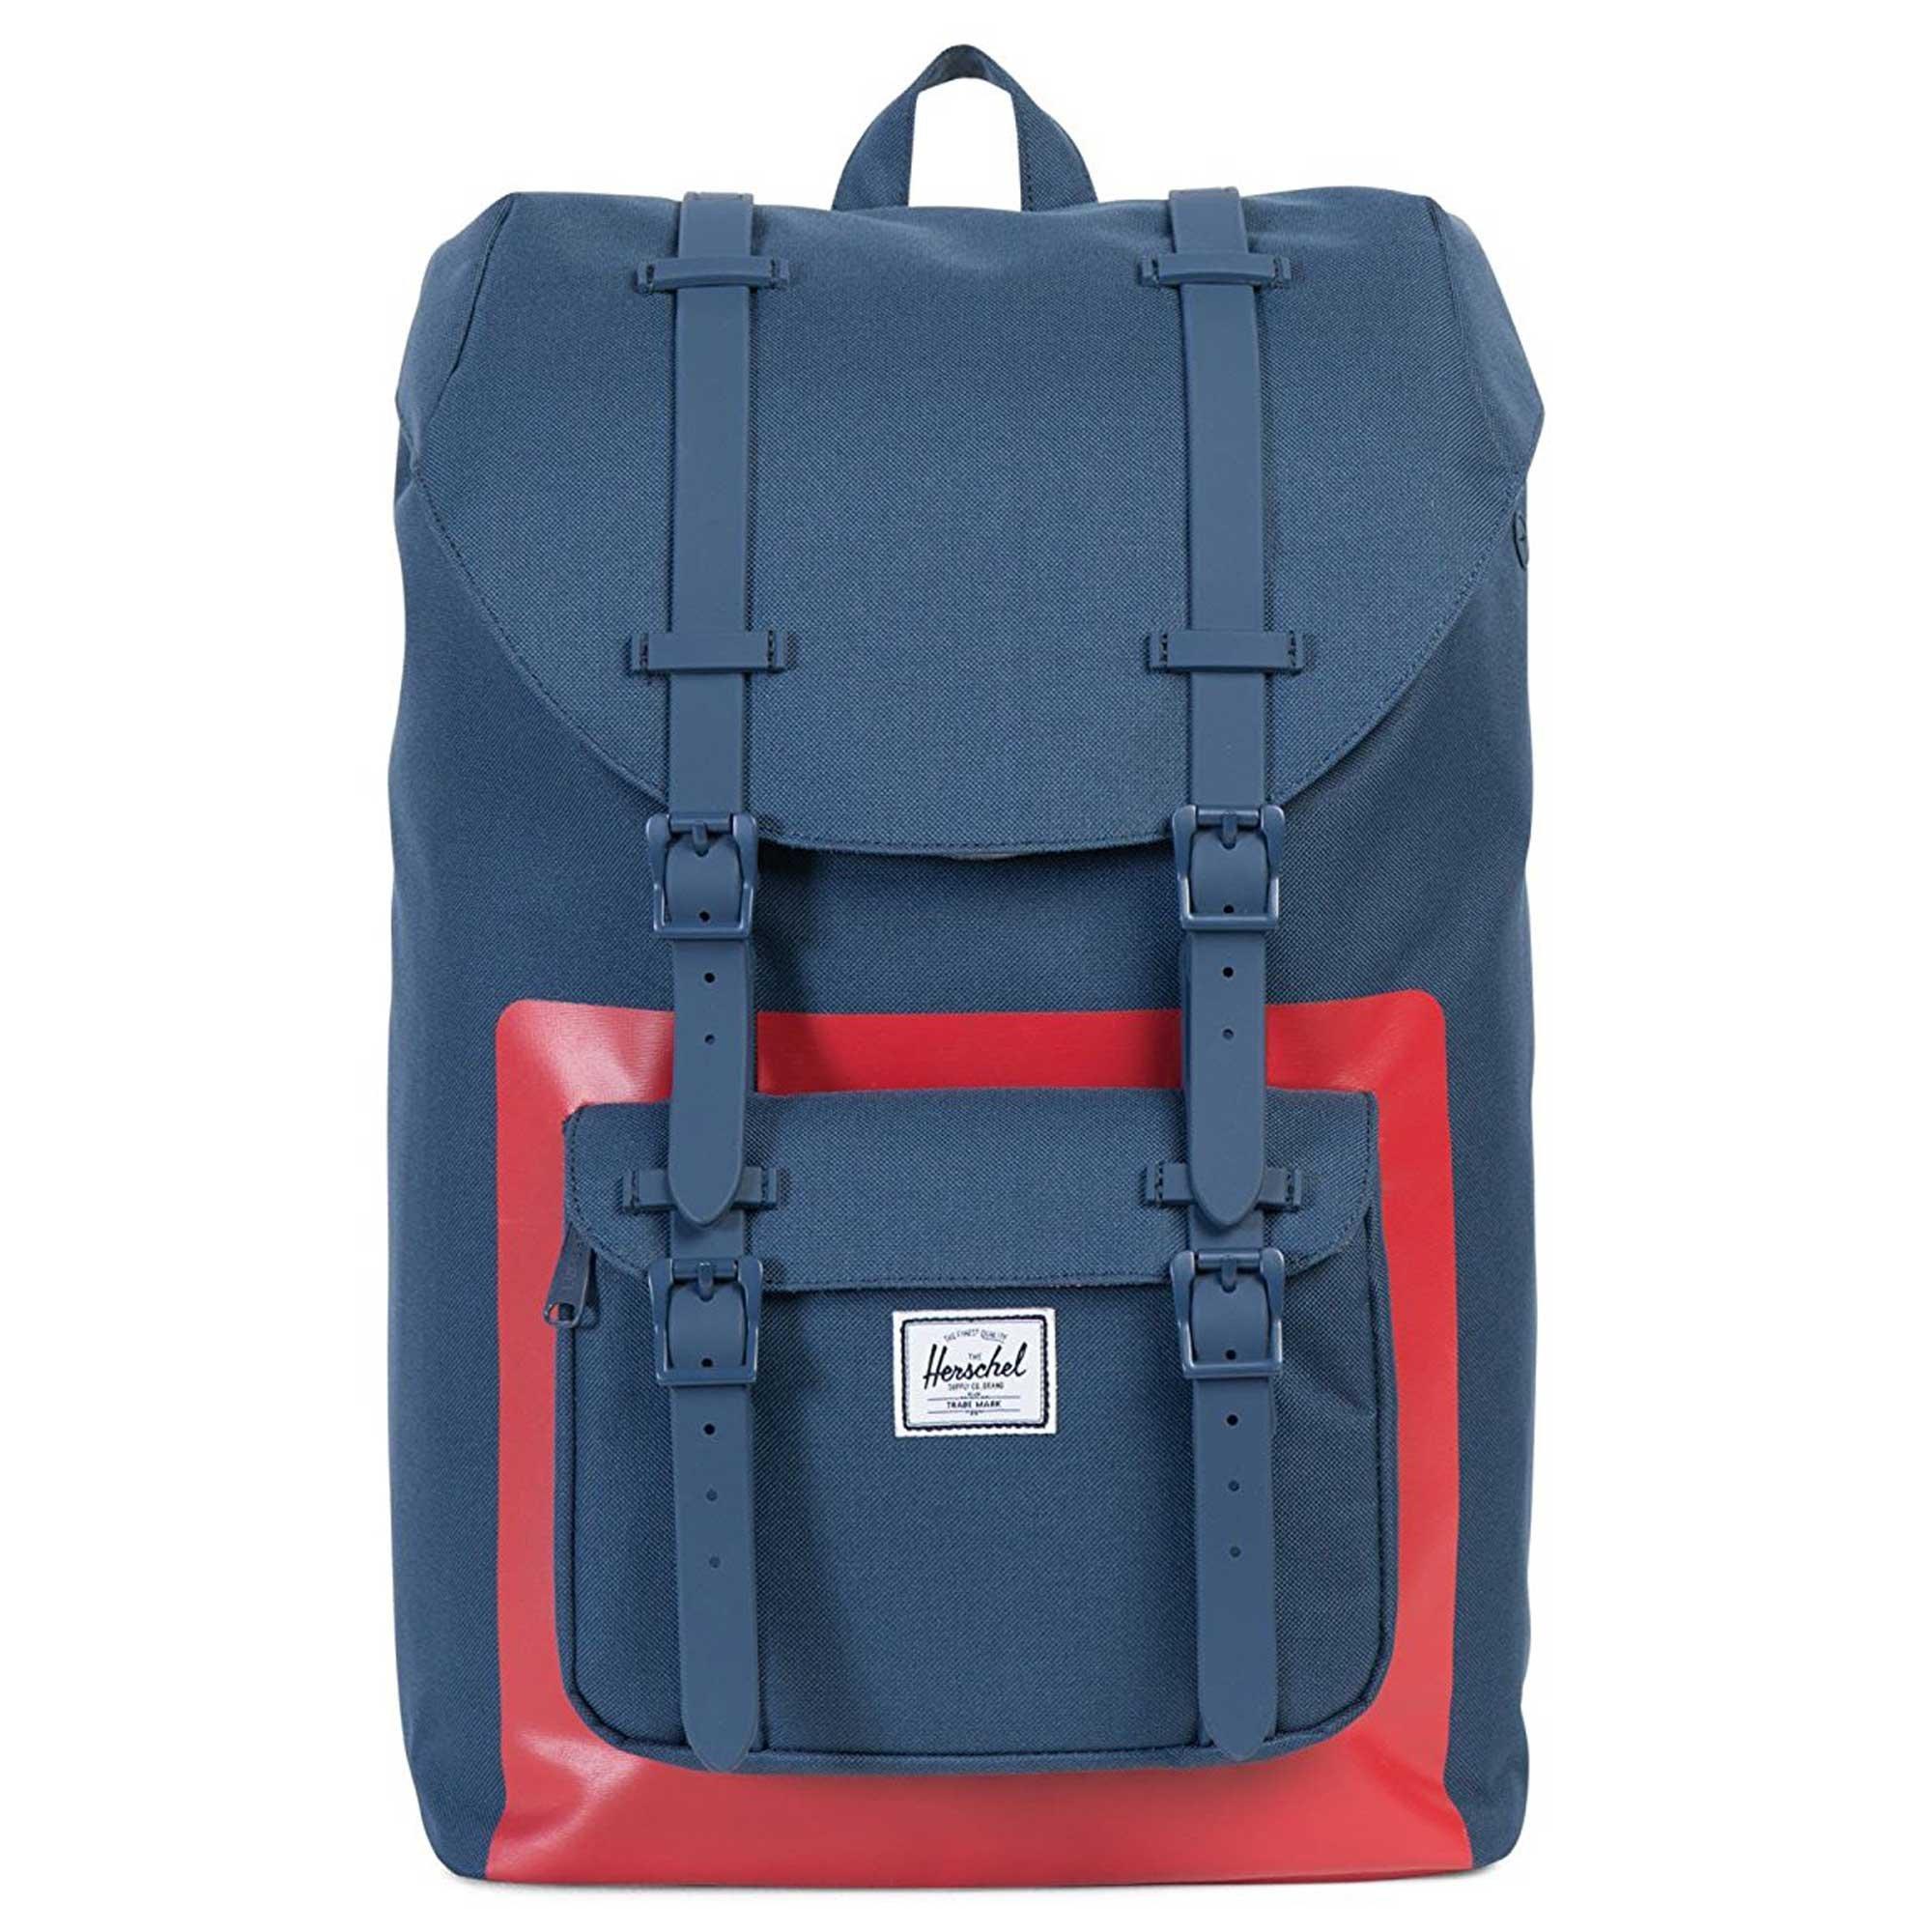 Herschel Supply Co. Women's Little America Backpack, Navy/Red Block, One Size